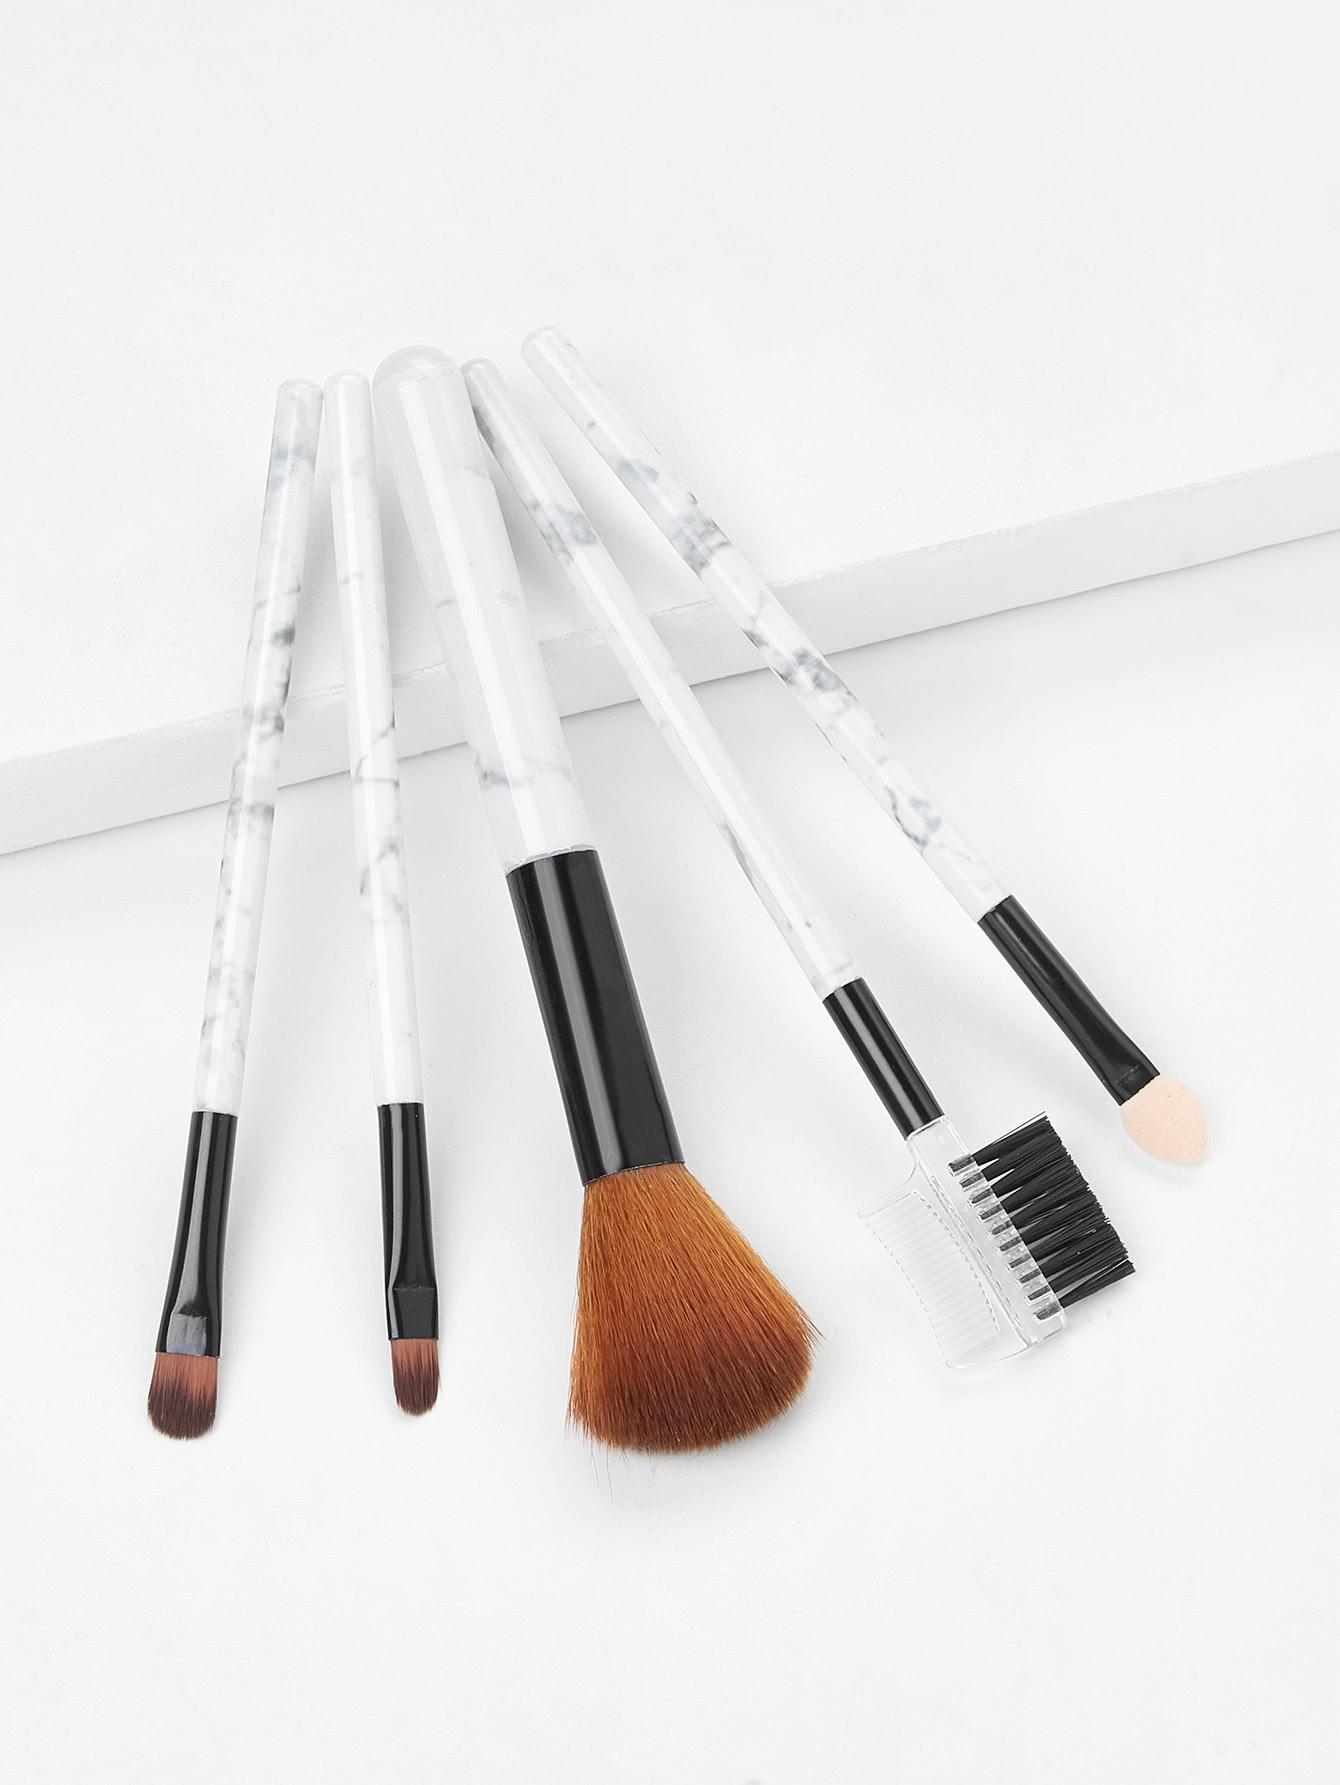 Floral Handle Makeup Brush 5pcs